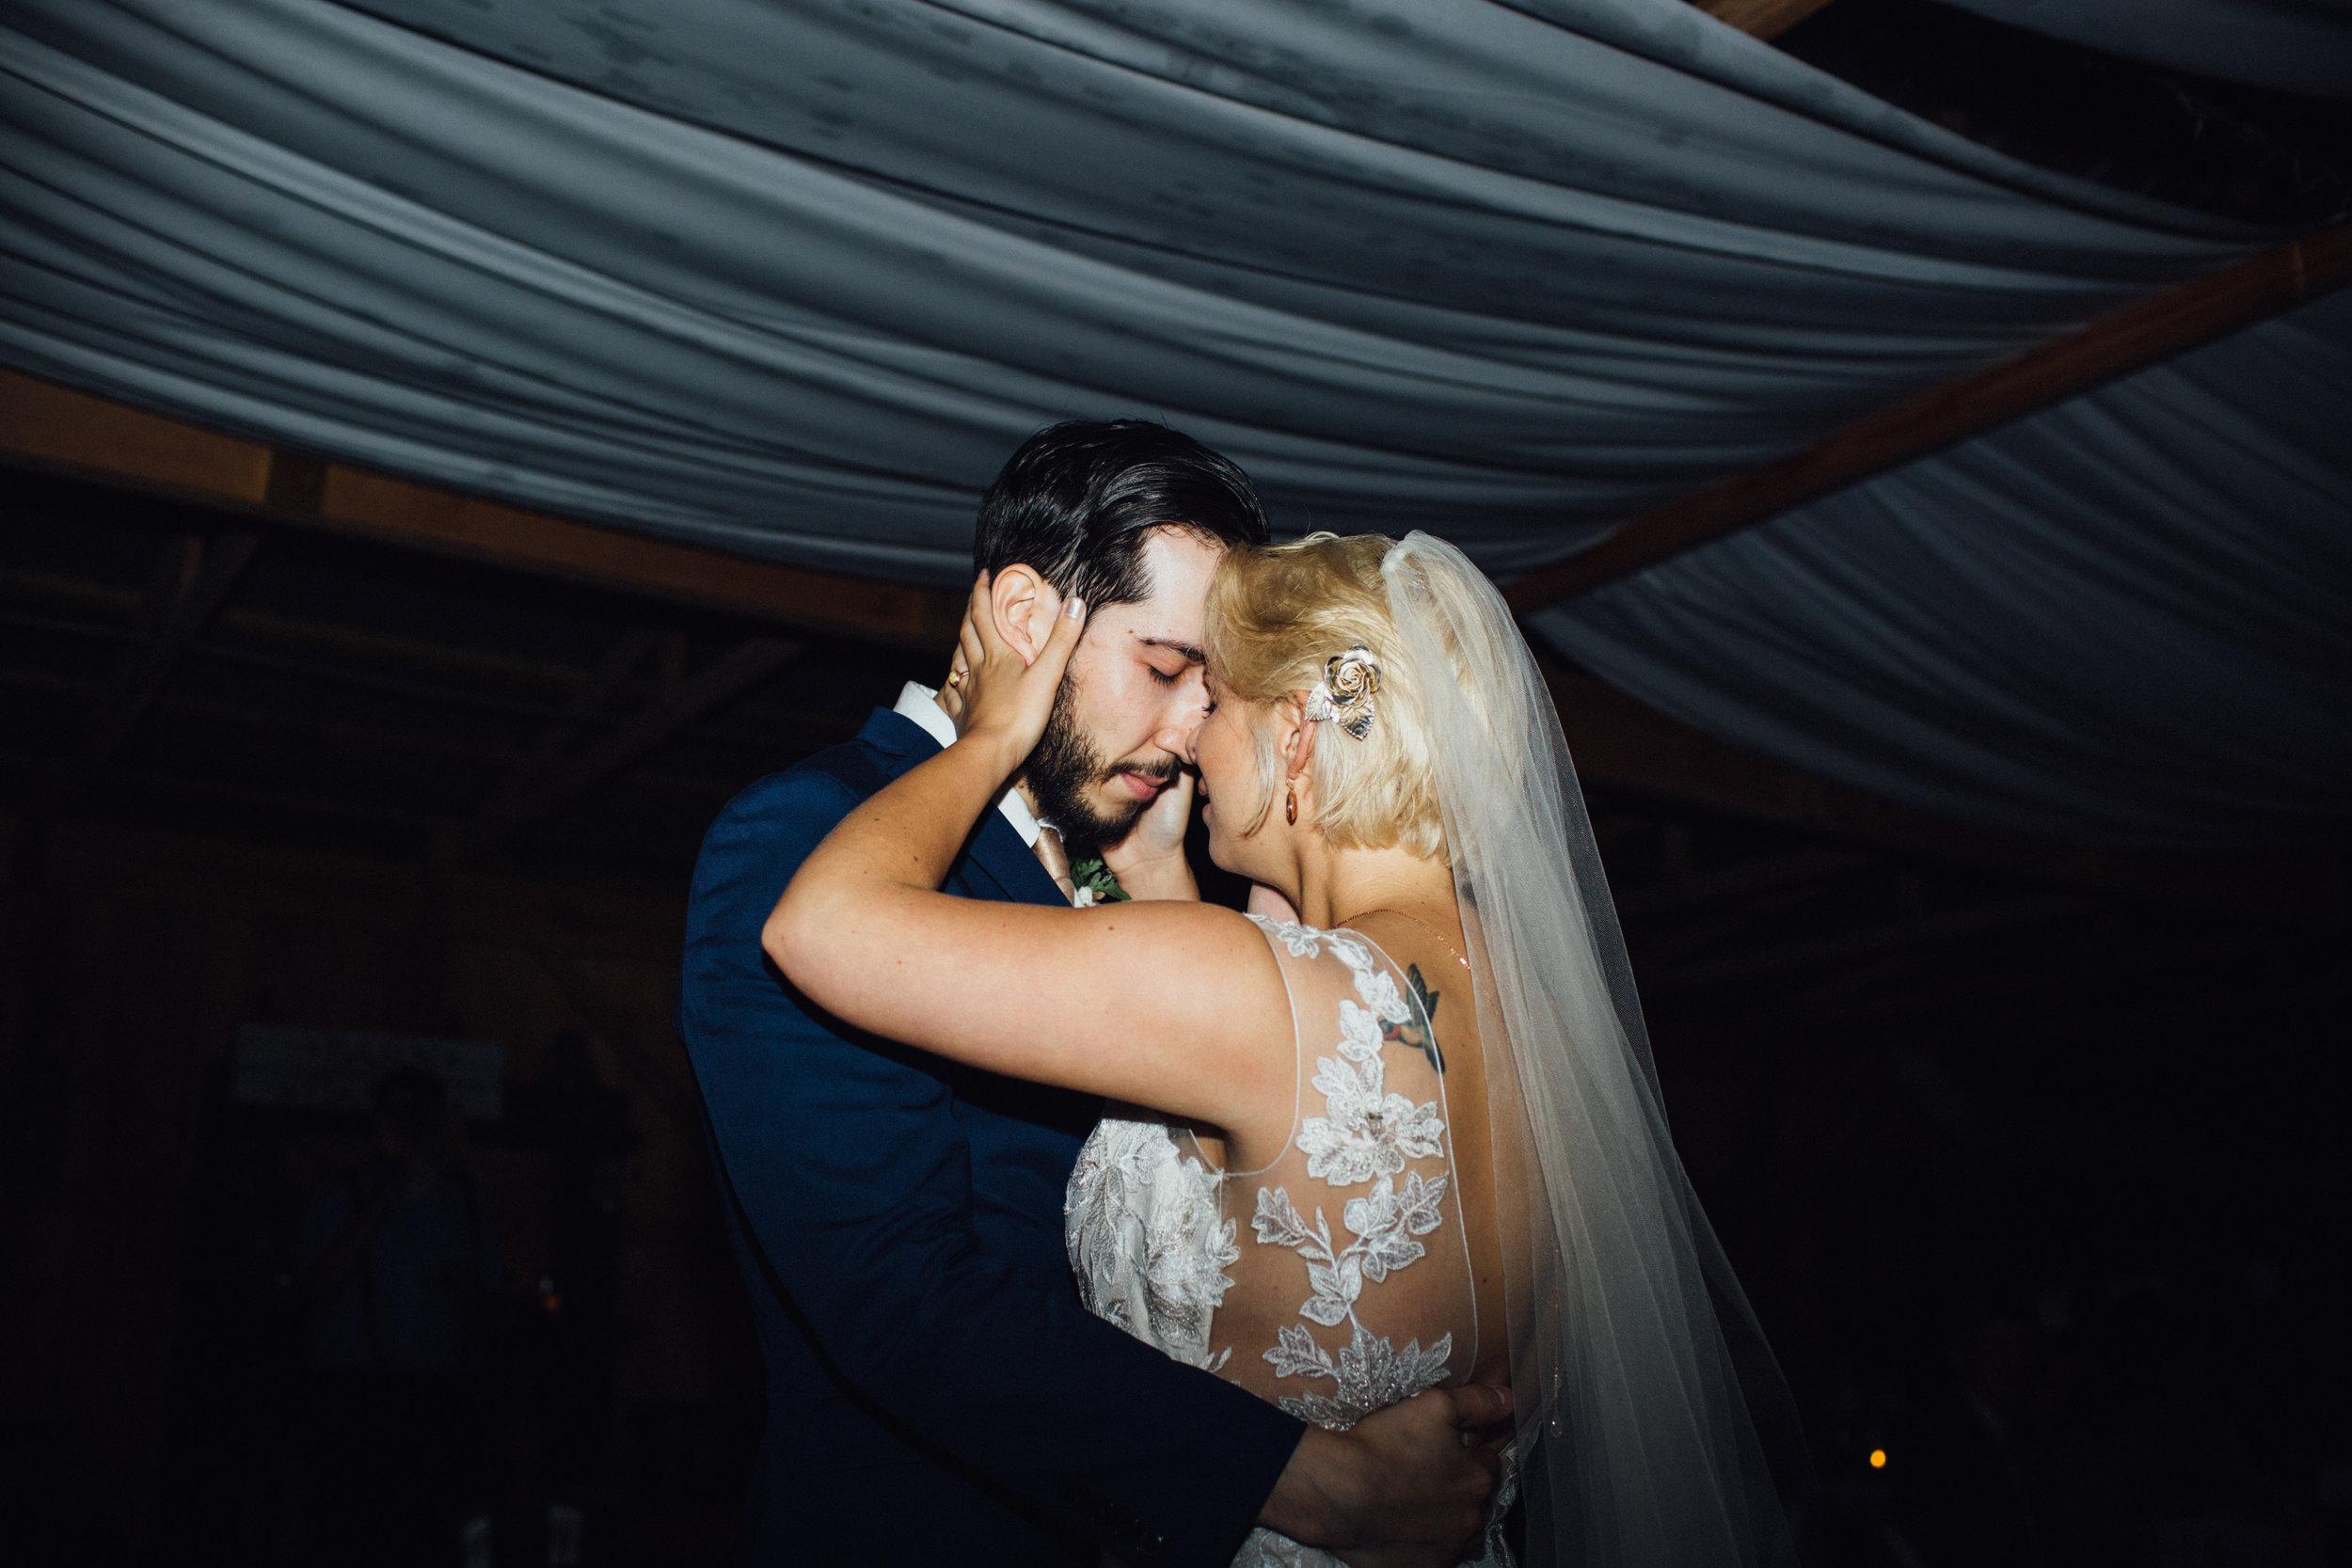 emotional first dance between bride and groom